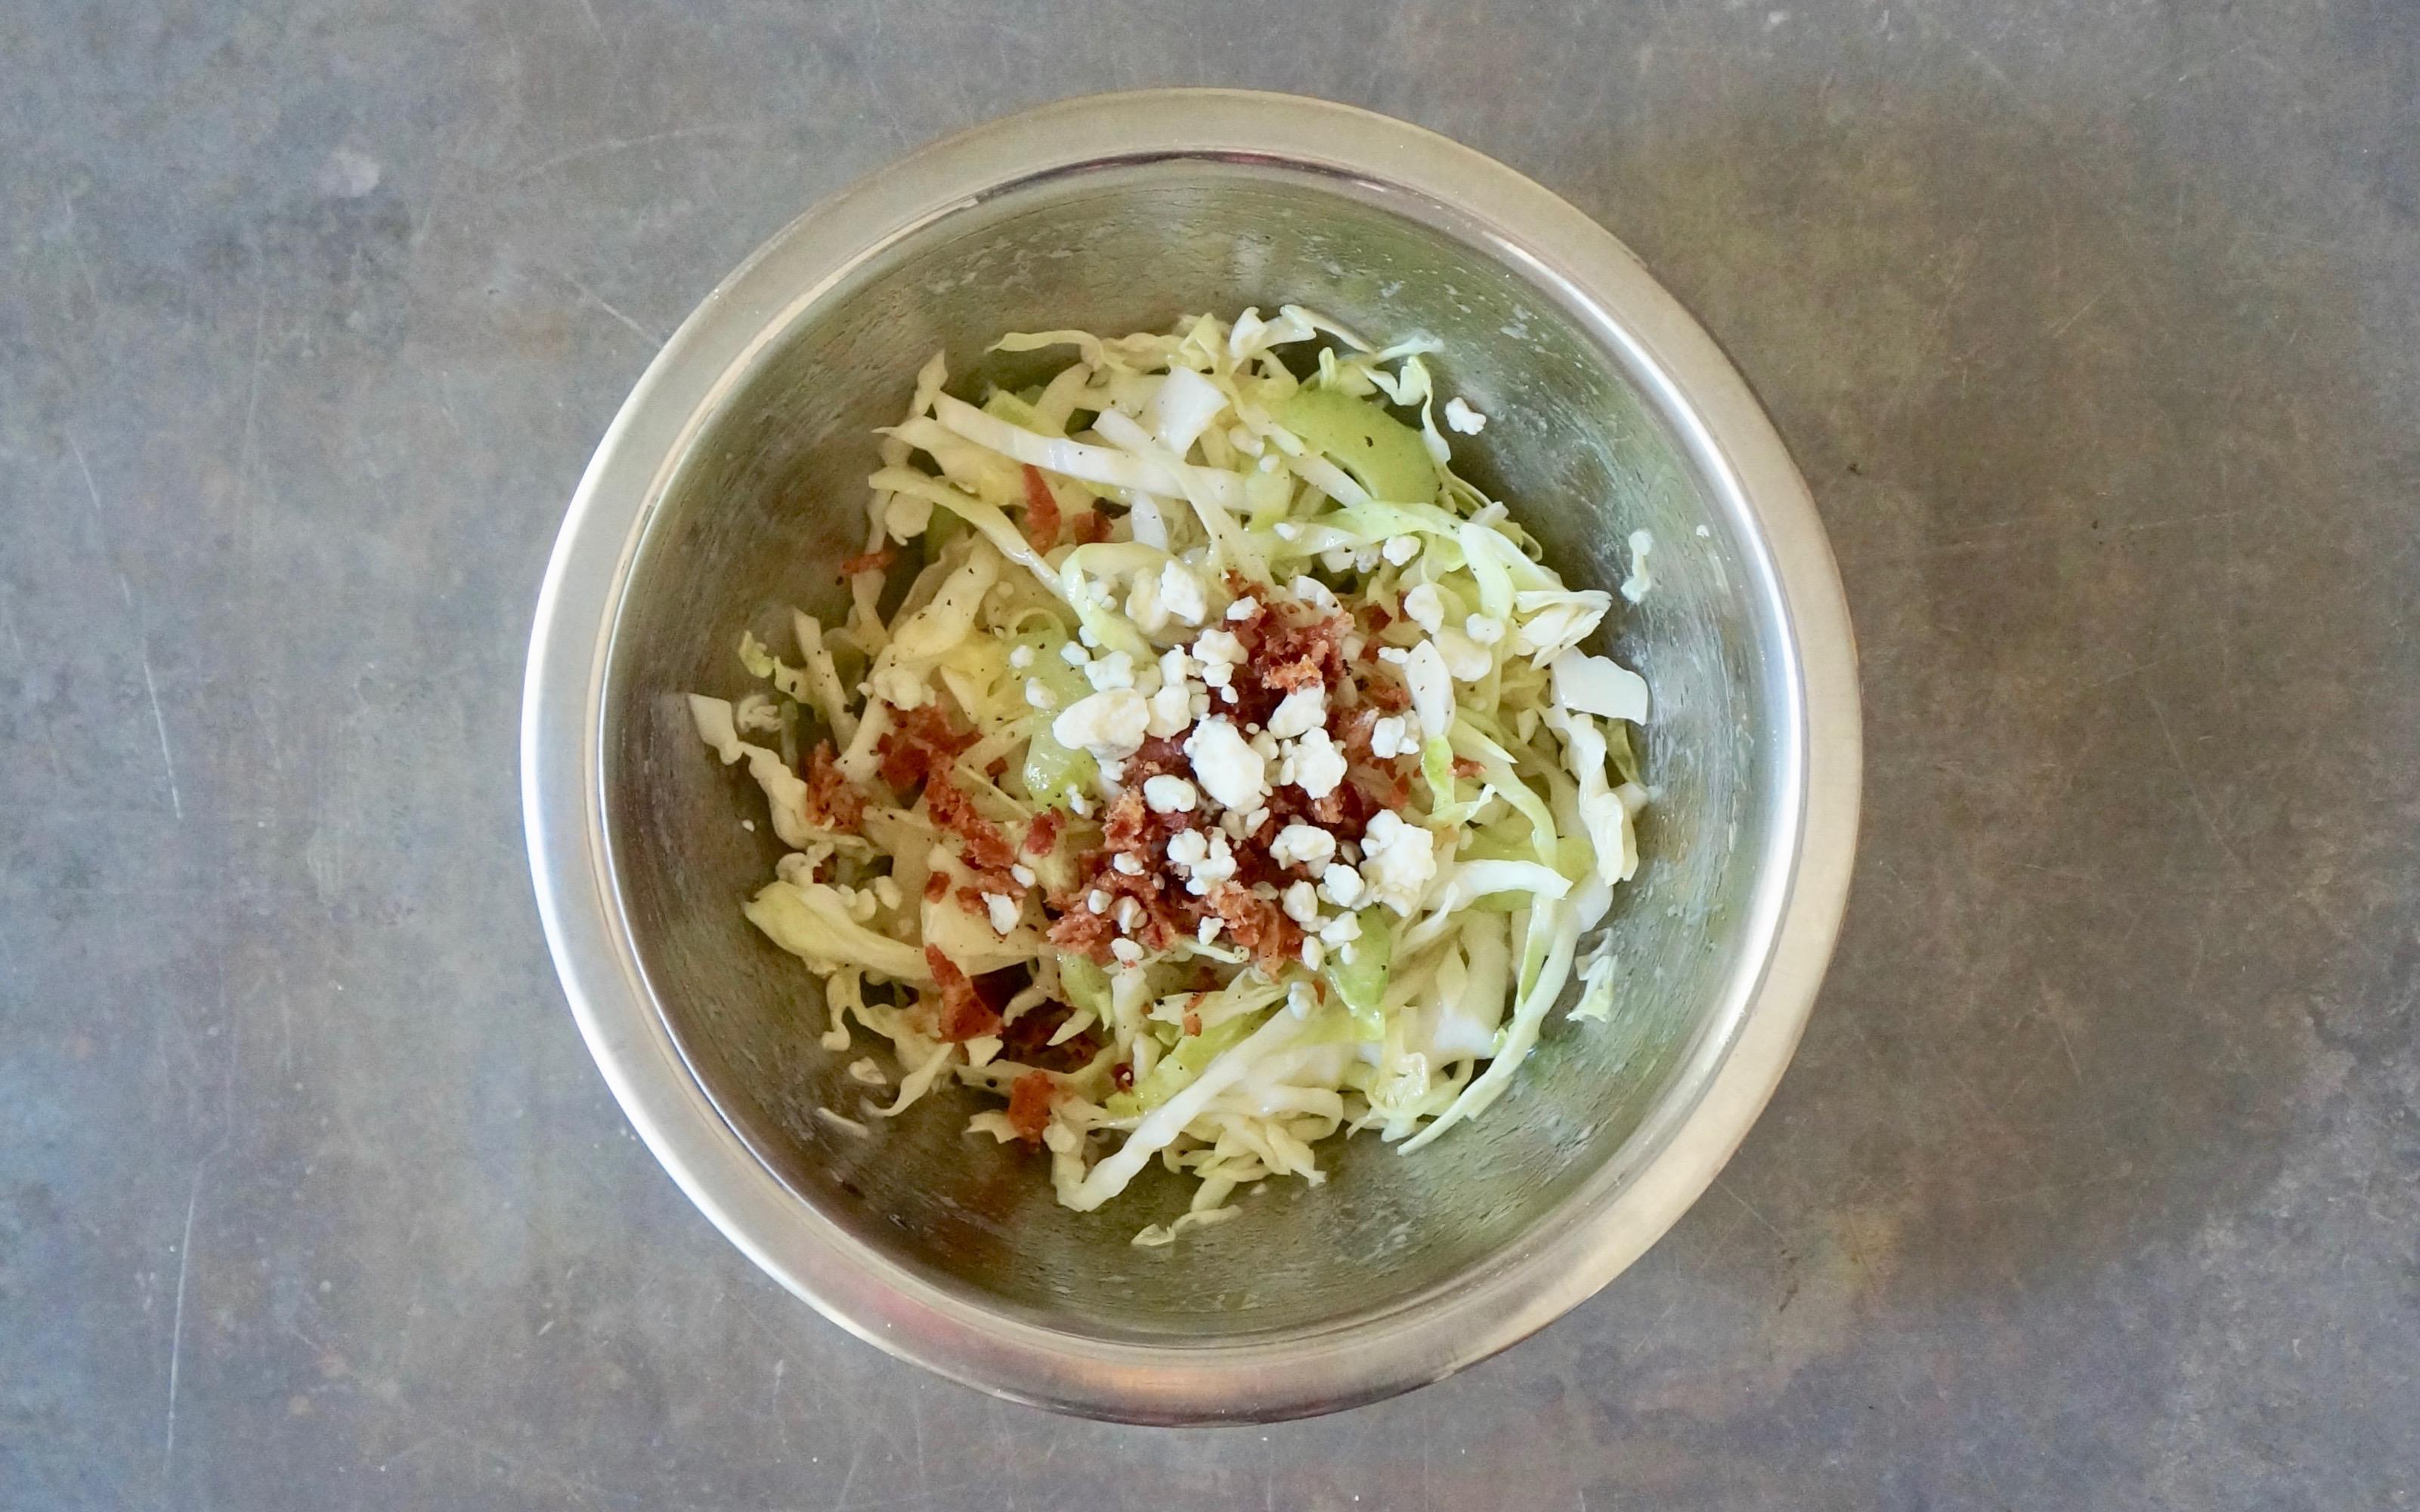 Bacon-Blue-Cheese-Slaw-Rebecca-Gordon-Publisher-Buttermilk-Lipstick-Culinary-Entertaining-Techniques-RebeccaGordon-Birmingham-Alabama